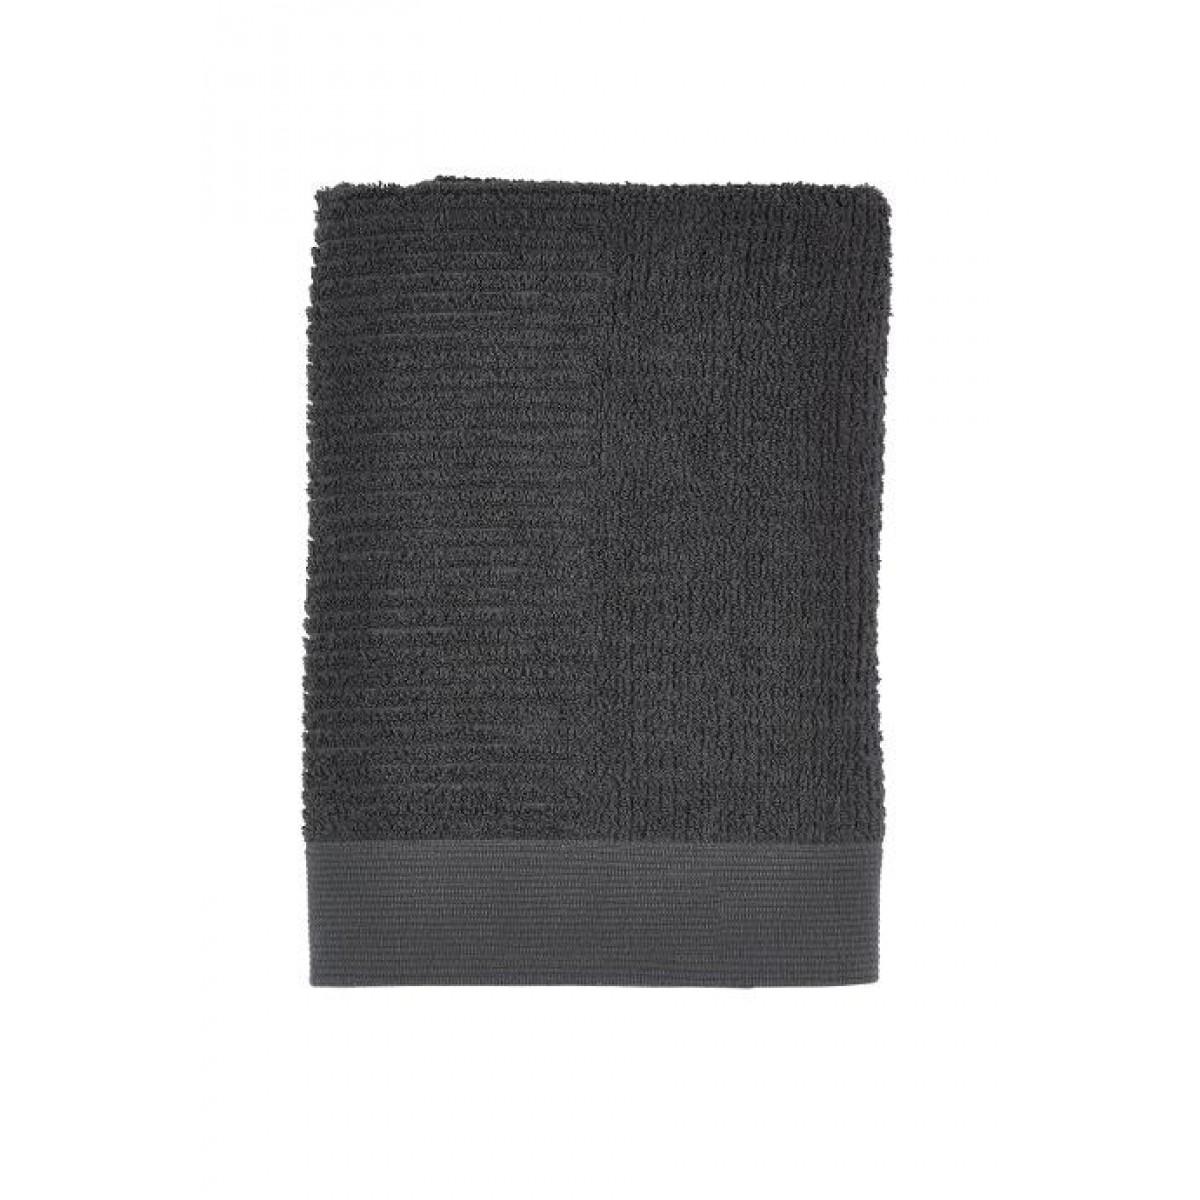 ZONE Classic håndklæde 70 x 140 cm. antracit grå